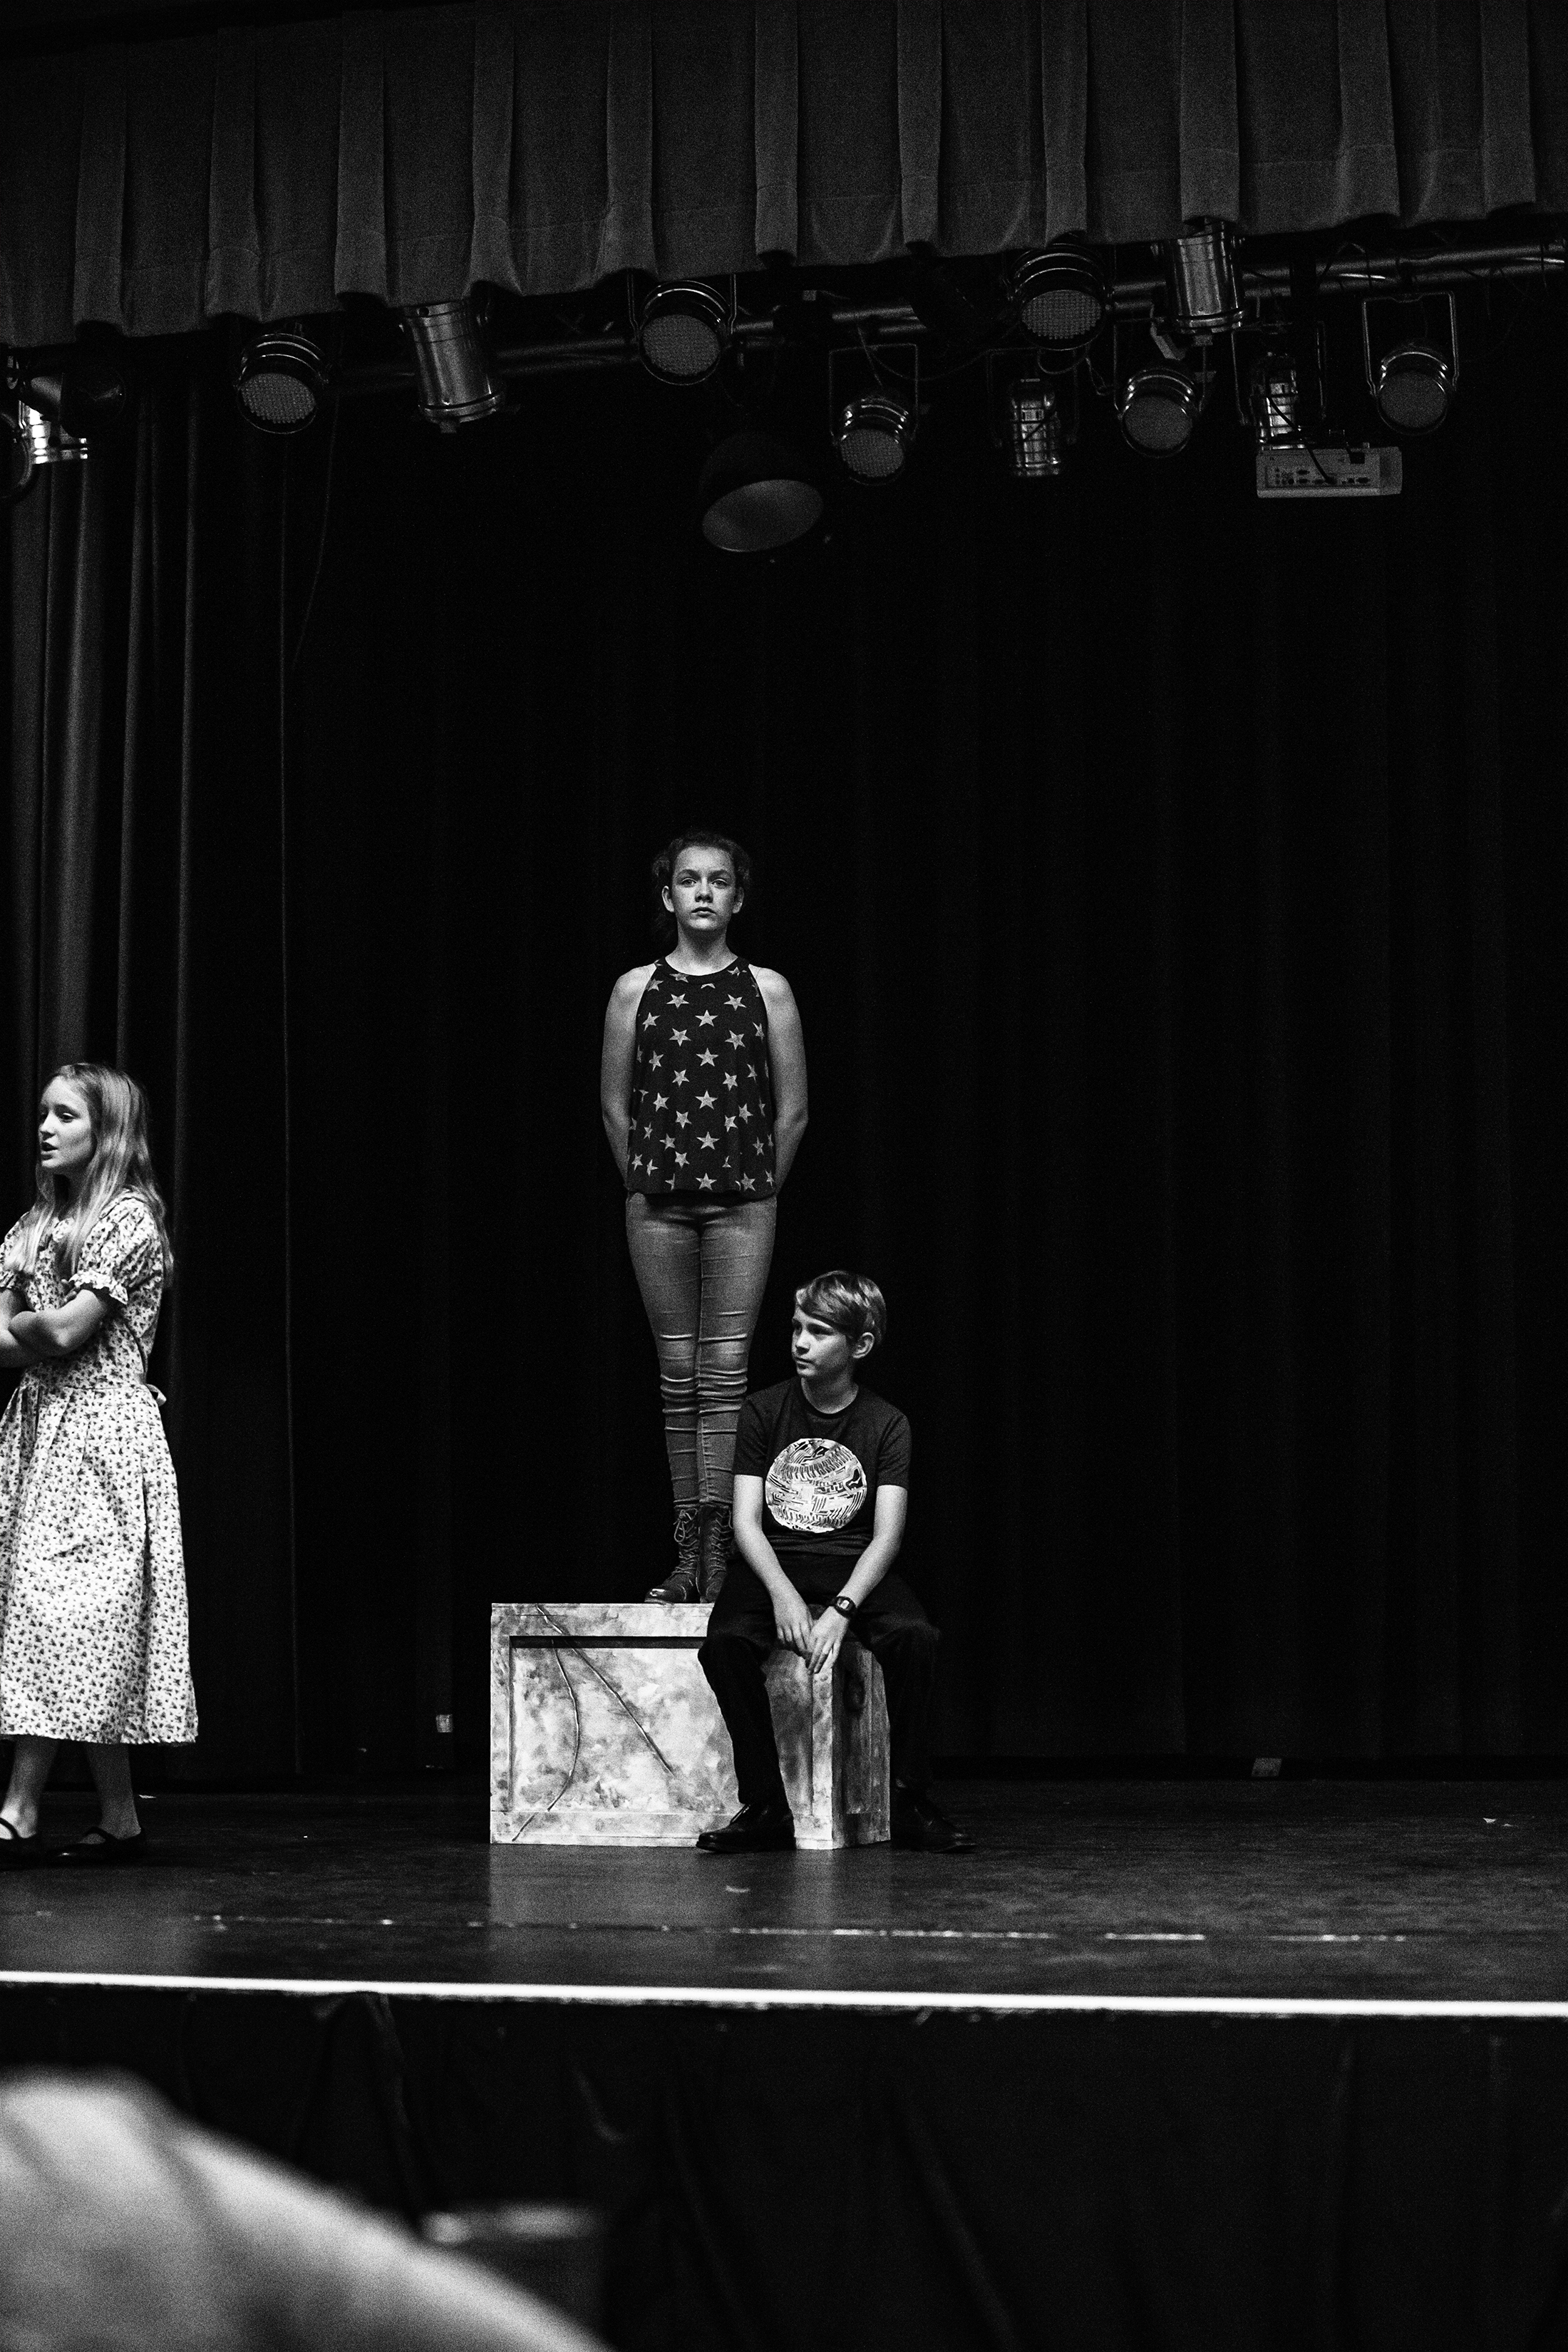 Mary Poppins - Streetlight Theatre Company - Rehearsal Shoot #2 - 23 Sep '18 - 046m (B&W).jpg